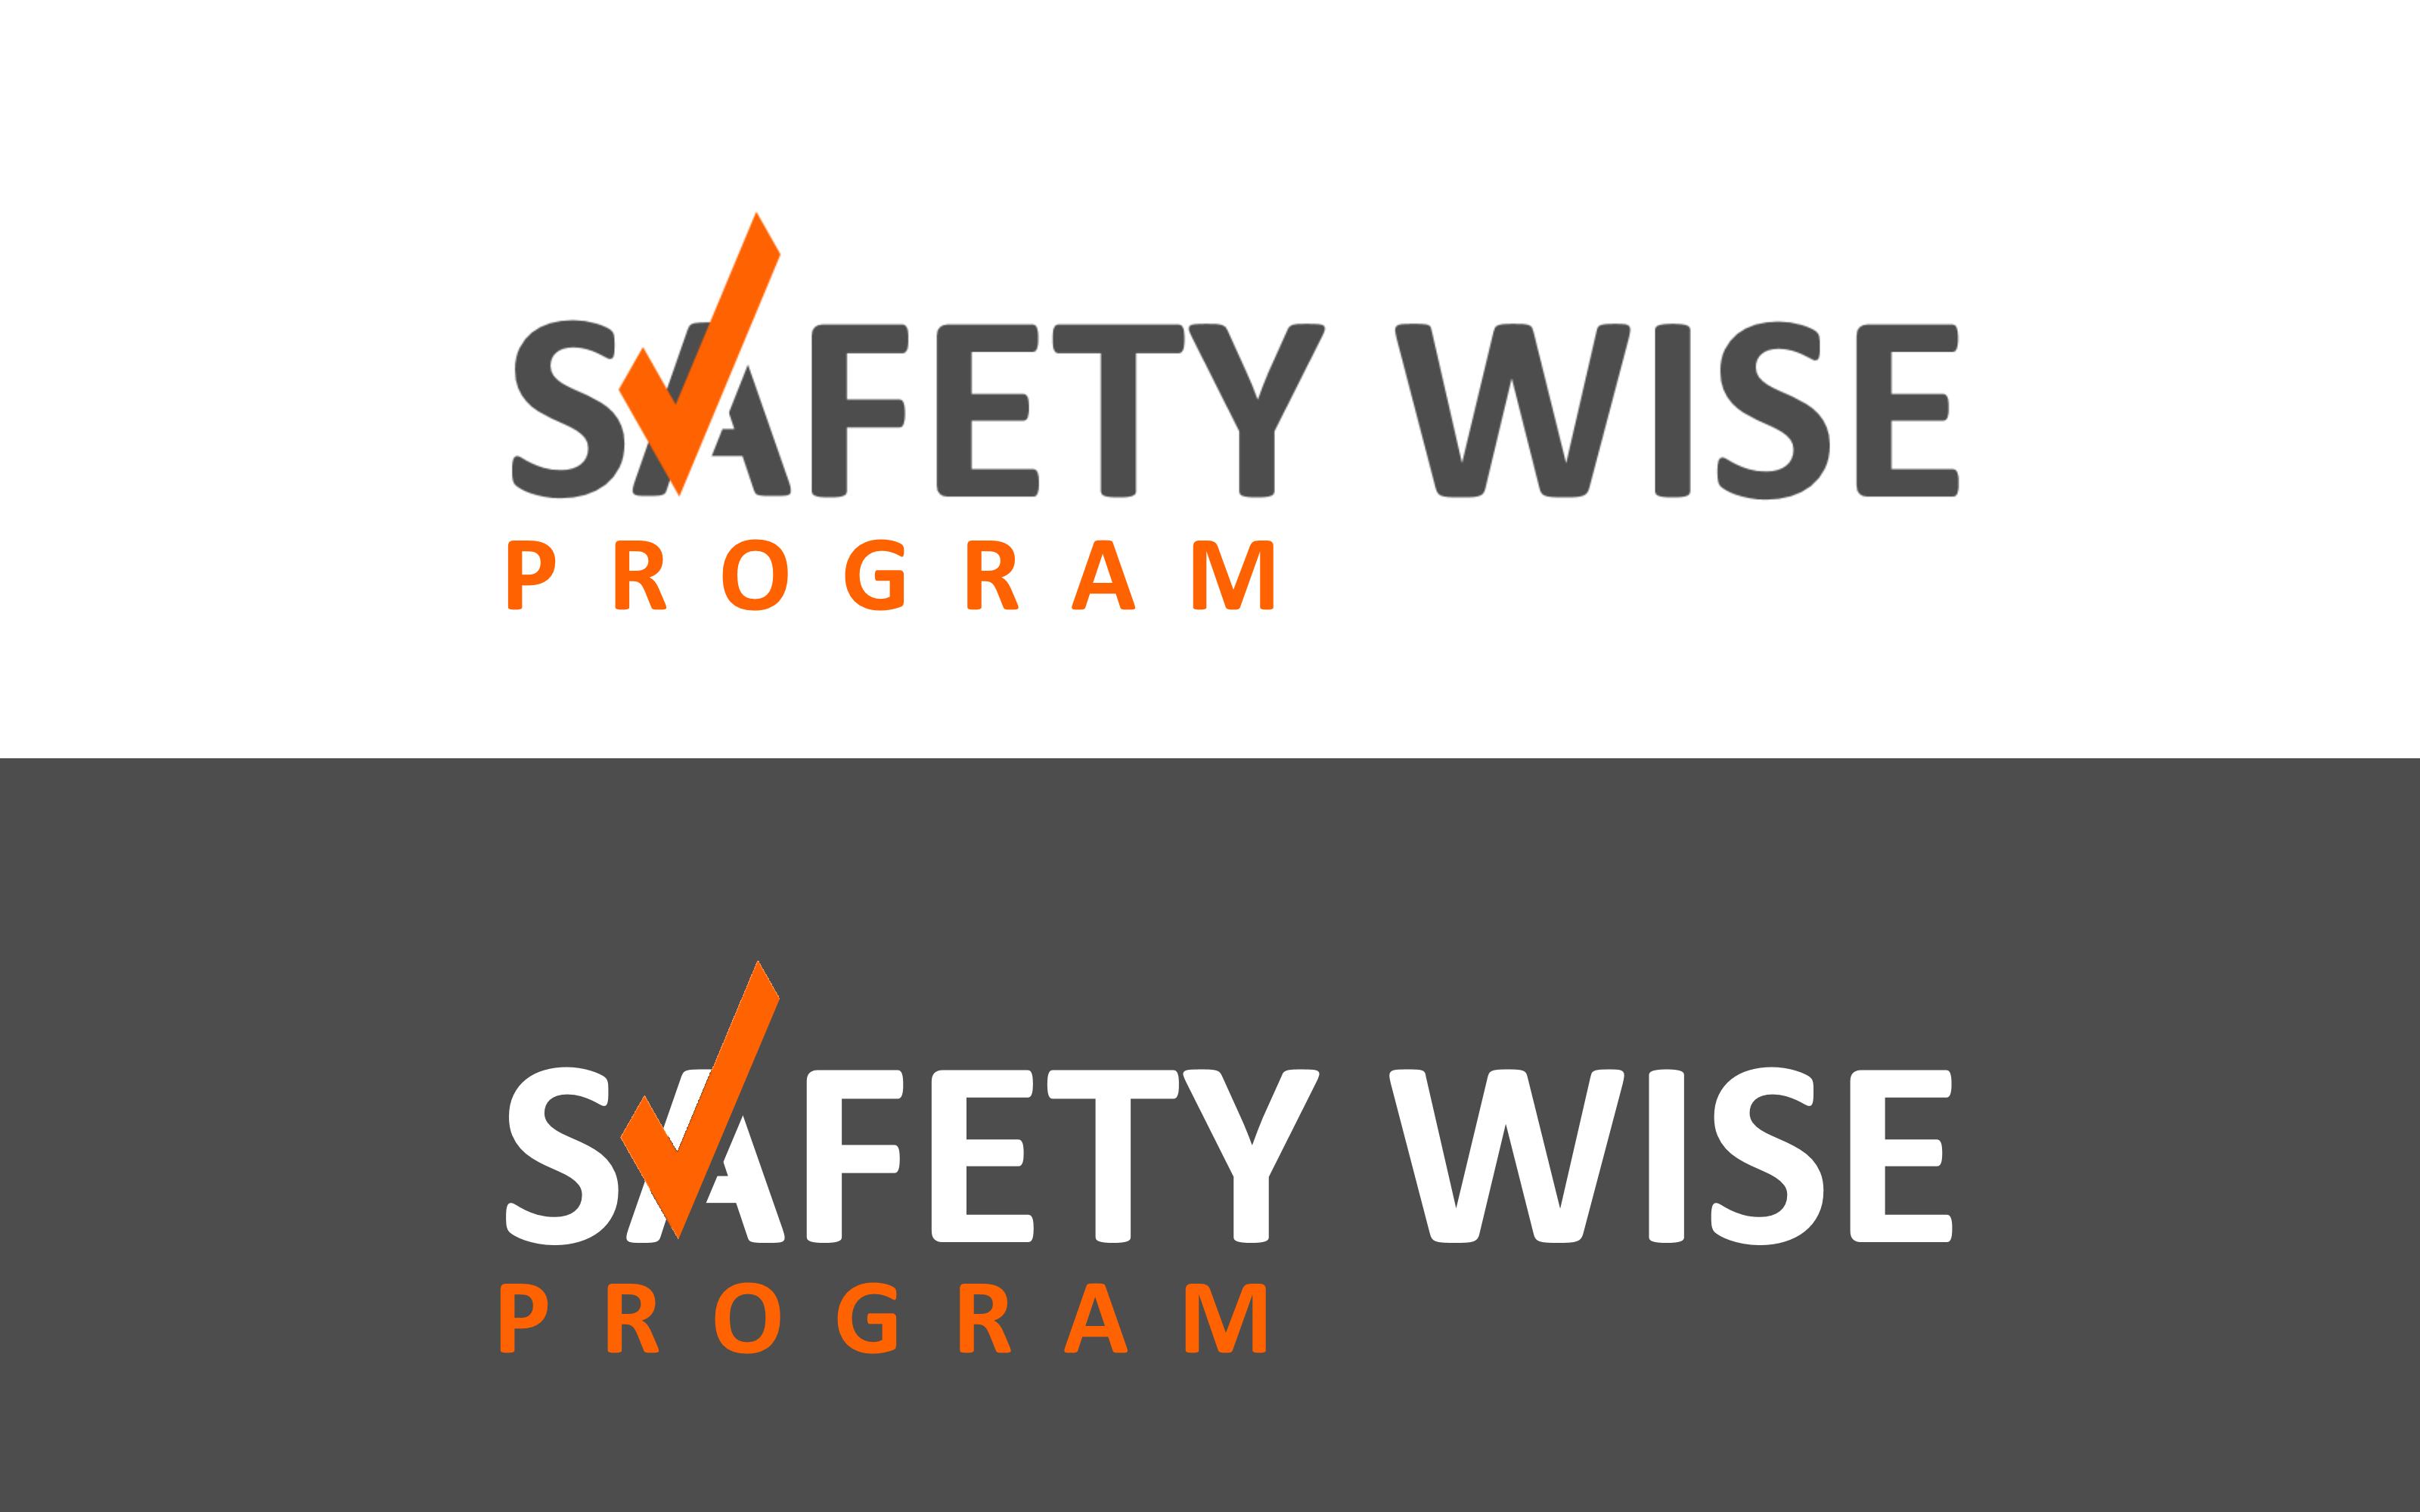 Logo Design by Roberto Bassi - Entry No. 164 in the Logo Design Contest New Logo Design for Safety Wise Program.